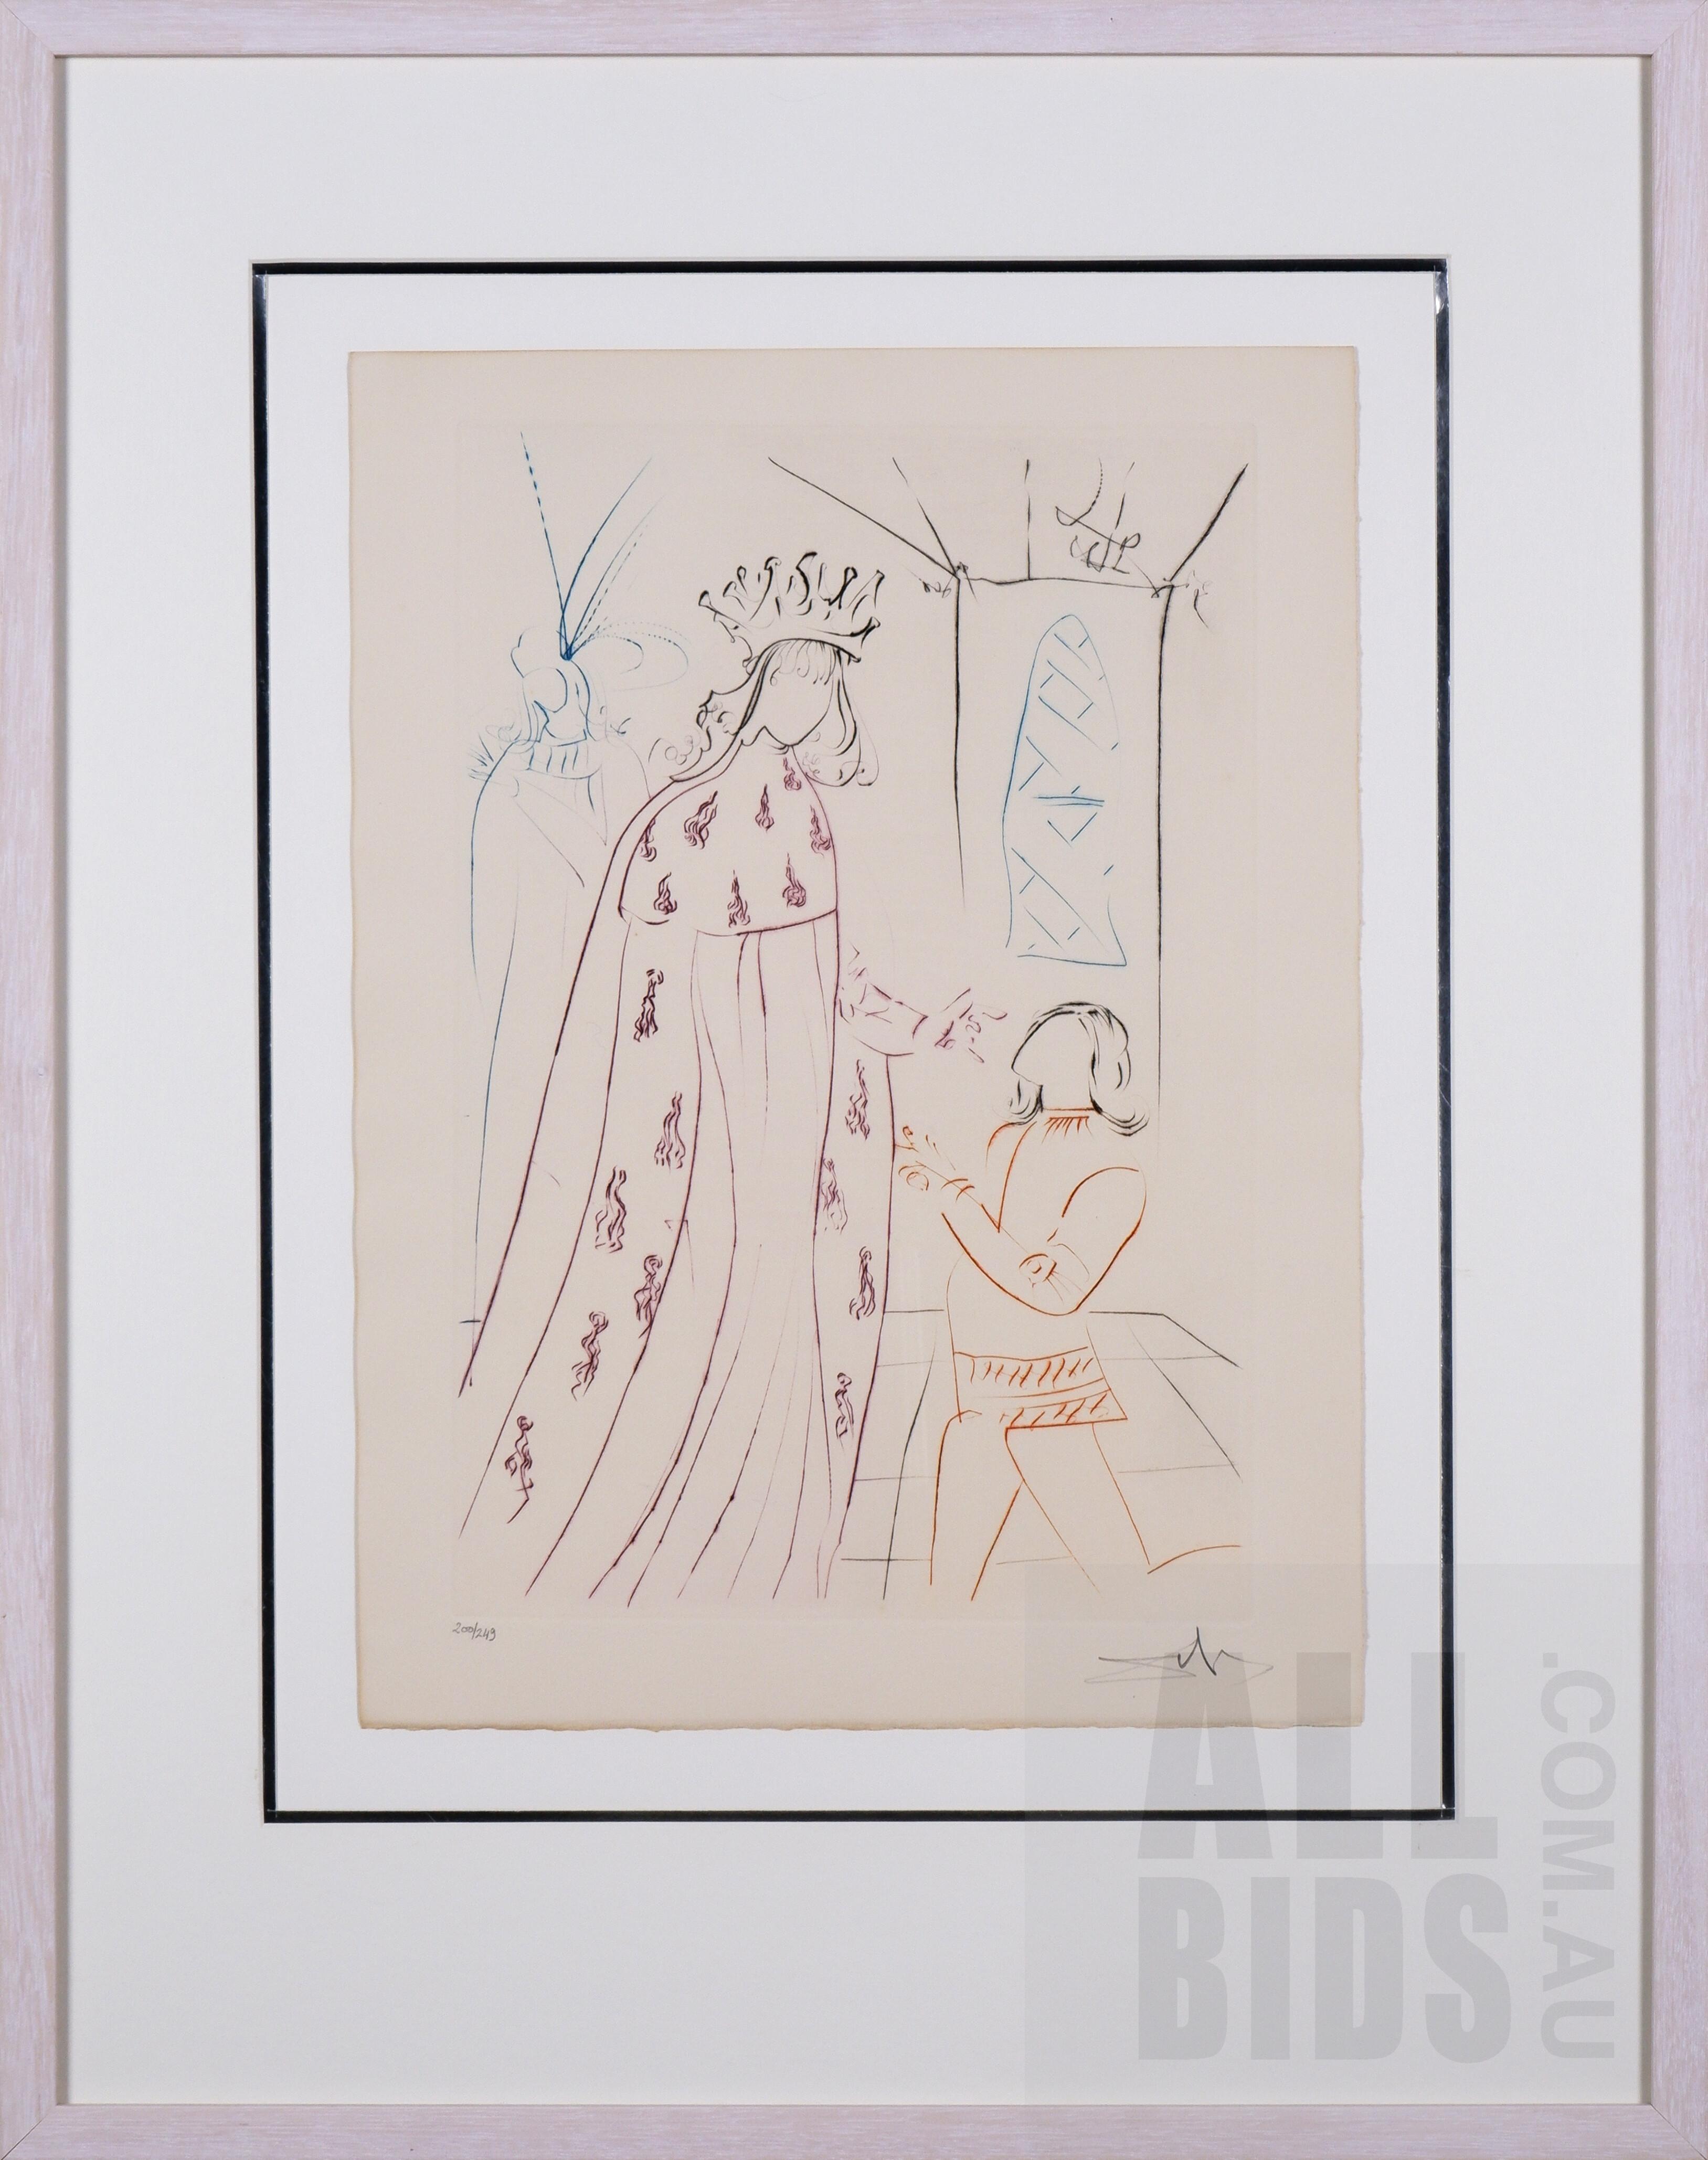 'Salvador Dali (1904-1989, Spanish), Ladoublement de Lancelot (The Knighting of Lancelot) from La quete du Graal (The Quest for the Grail), Drypoint, 39.5 x 29 cm (image size)'